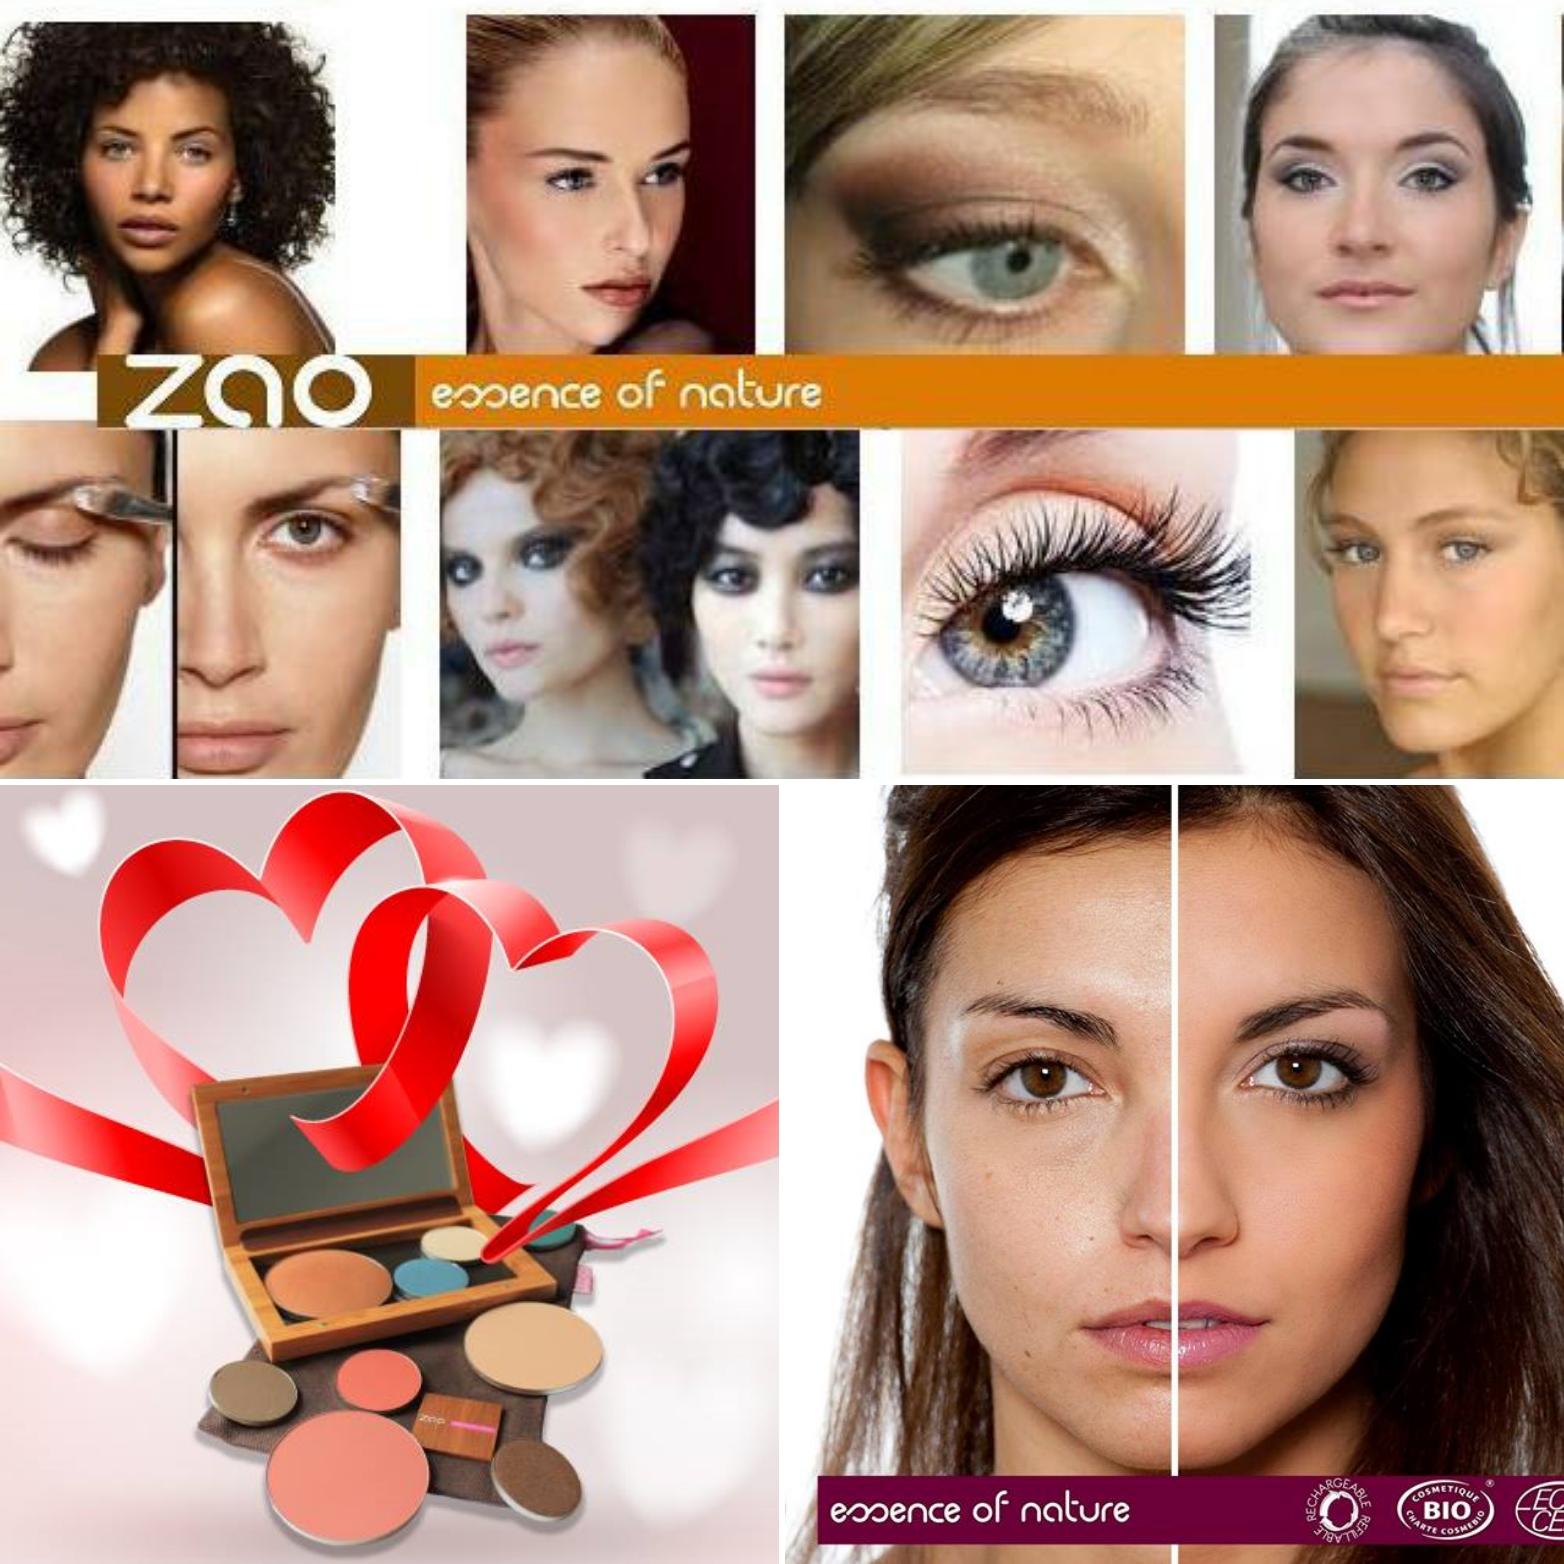 Maquillage naturel Zao Vannes